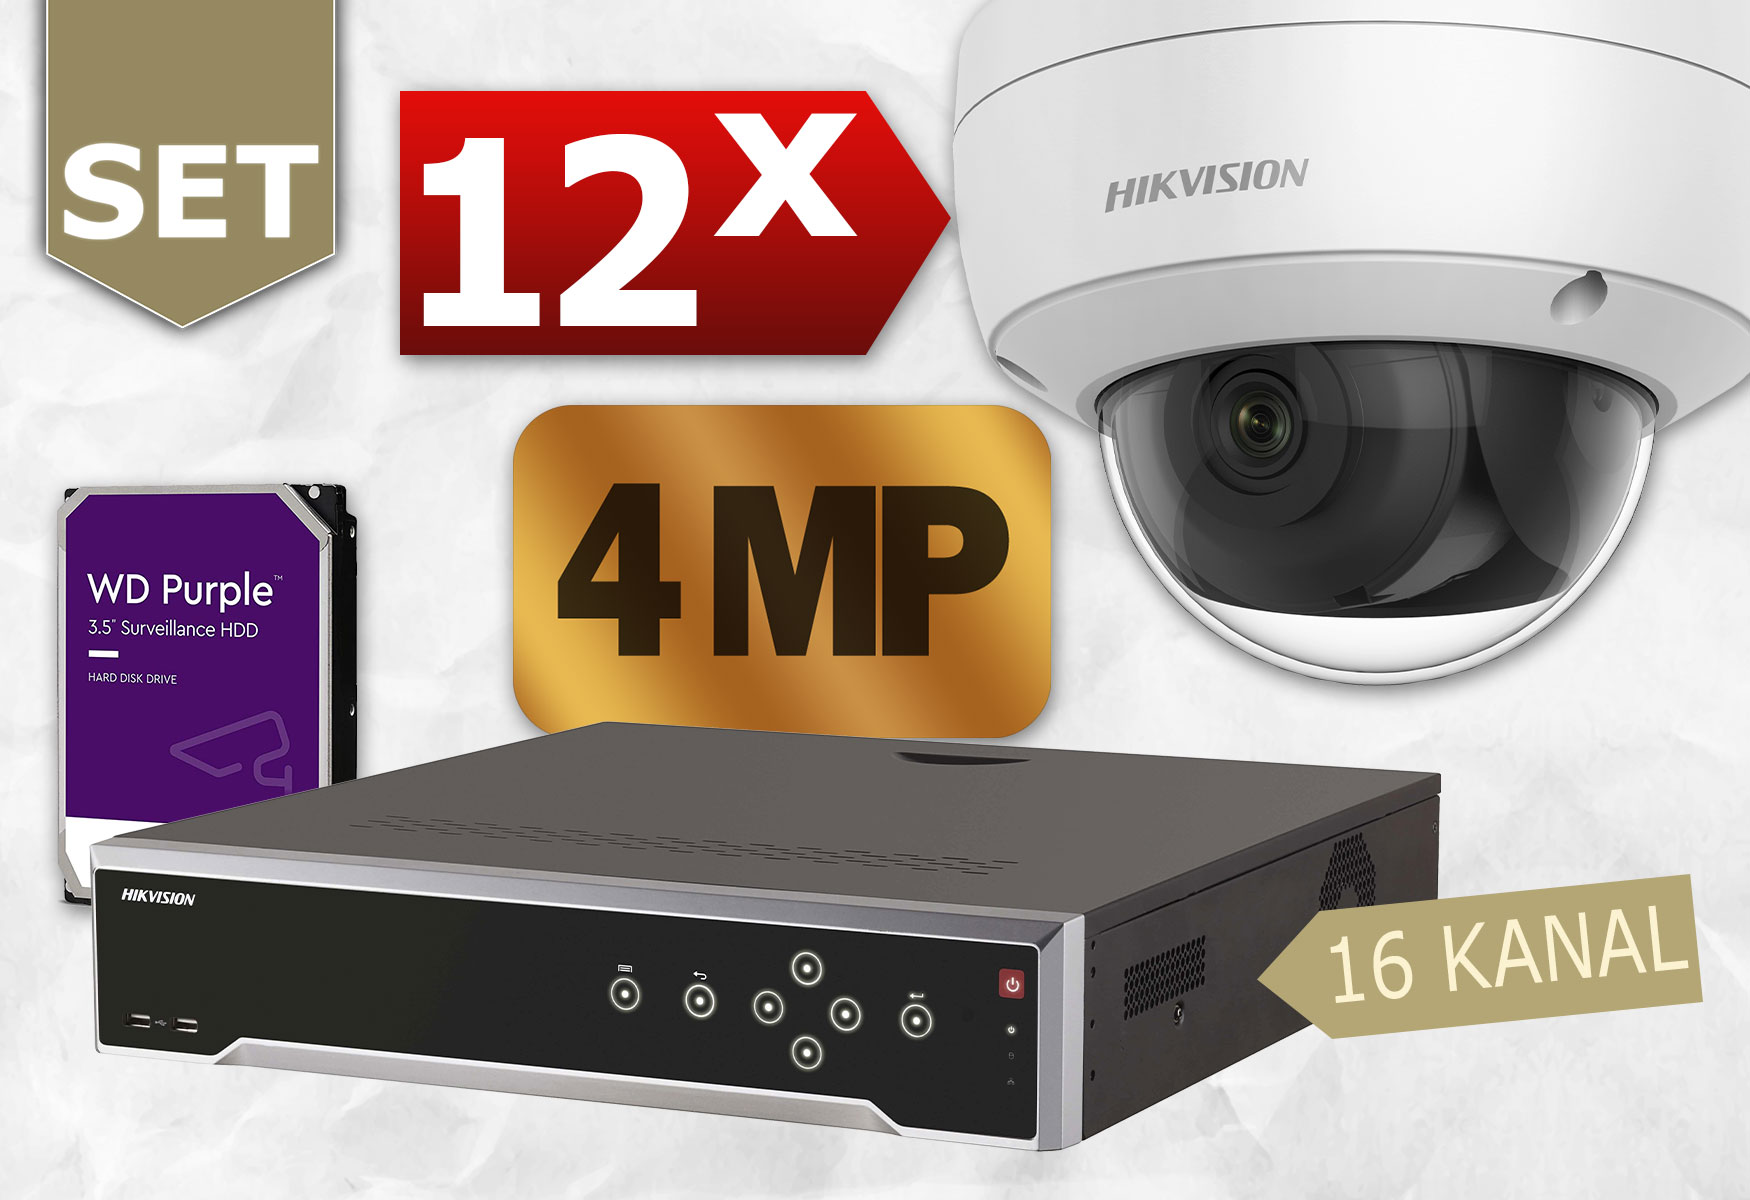 Dome-12x-4MP-16-Kanal-Netzwerkgeraet-ueberwachungskamera_set_nvr_ip_kamera-GekkoStuff_2.jpg